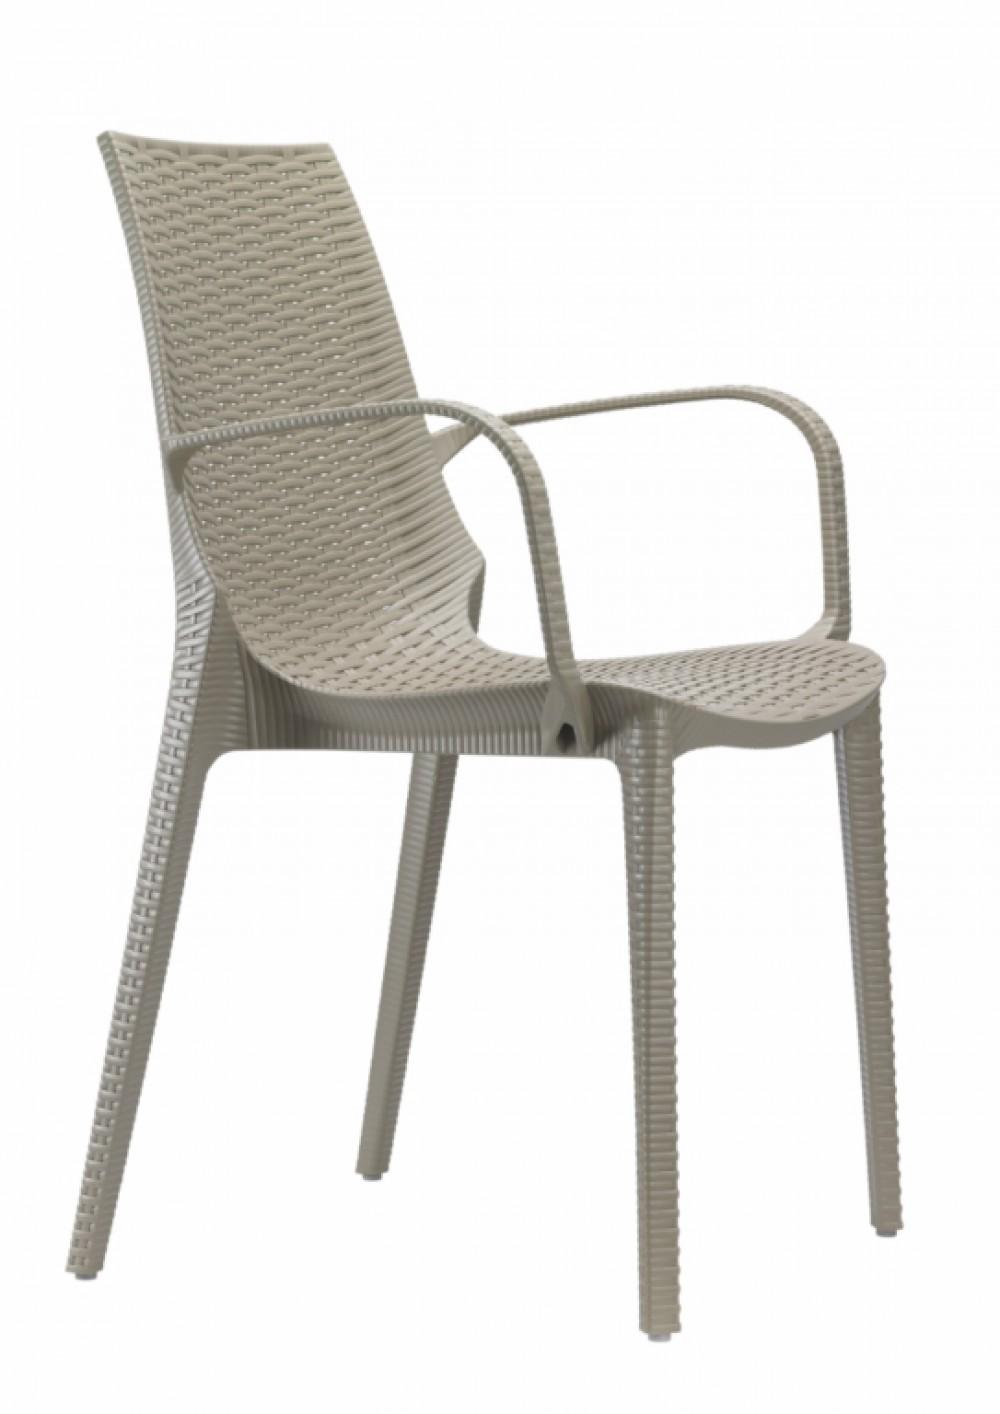 Design Gartenmöbel Stuhl Kunststoff taubengrau Glasfaser